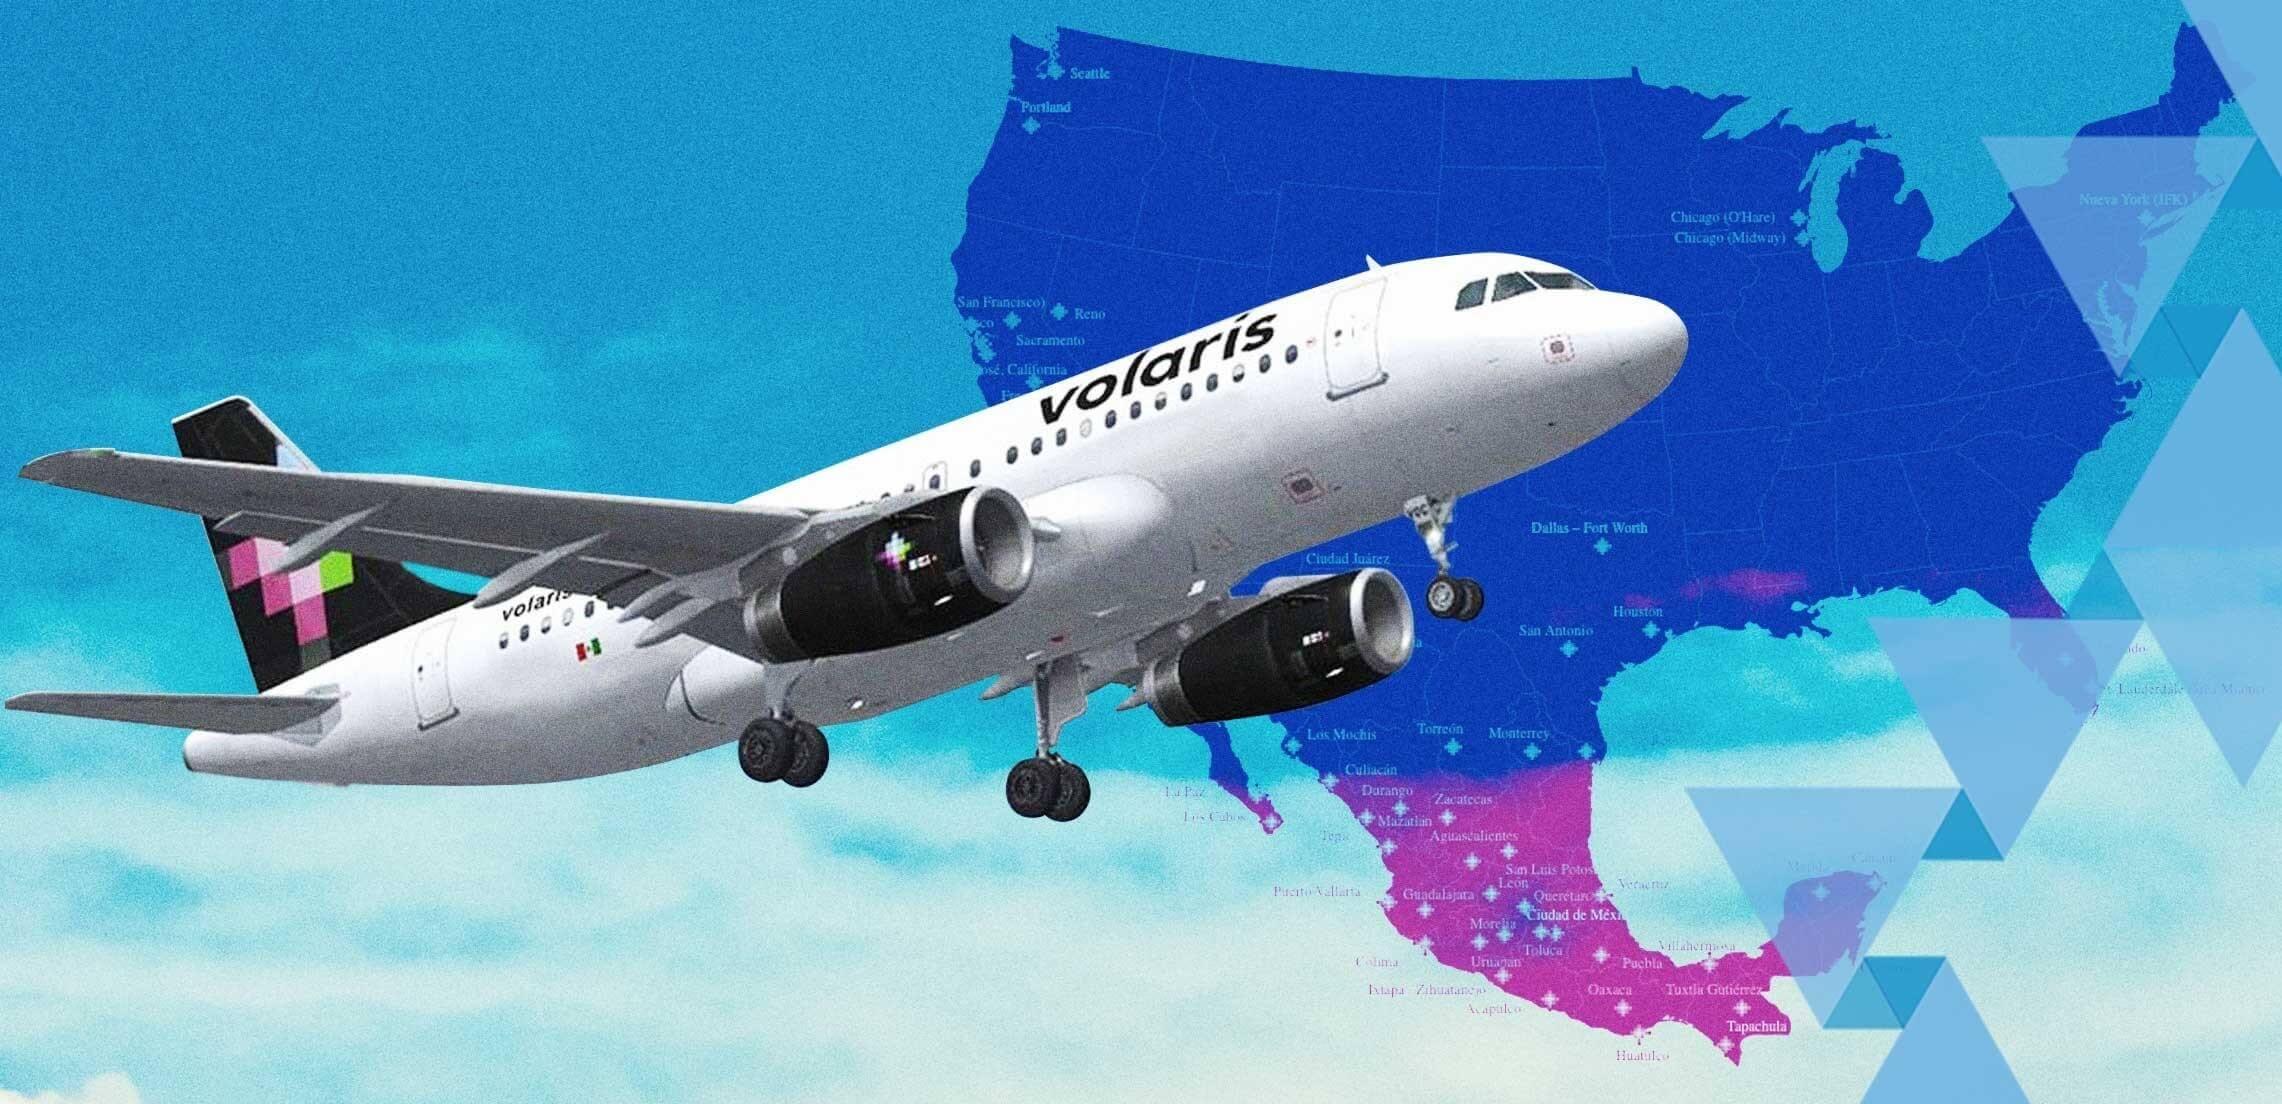 Volaris: Record 2 million passengers so far in 2019